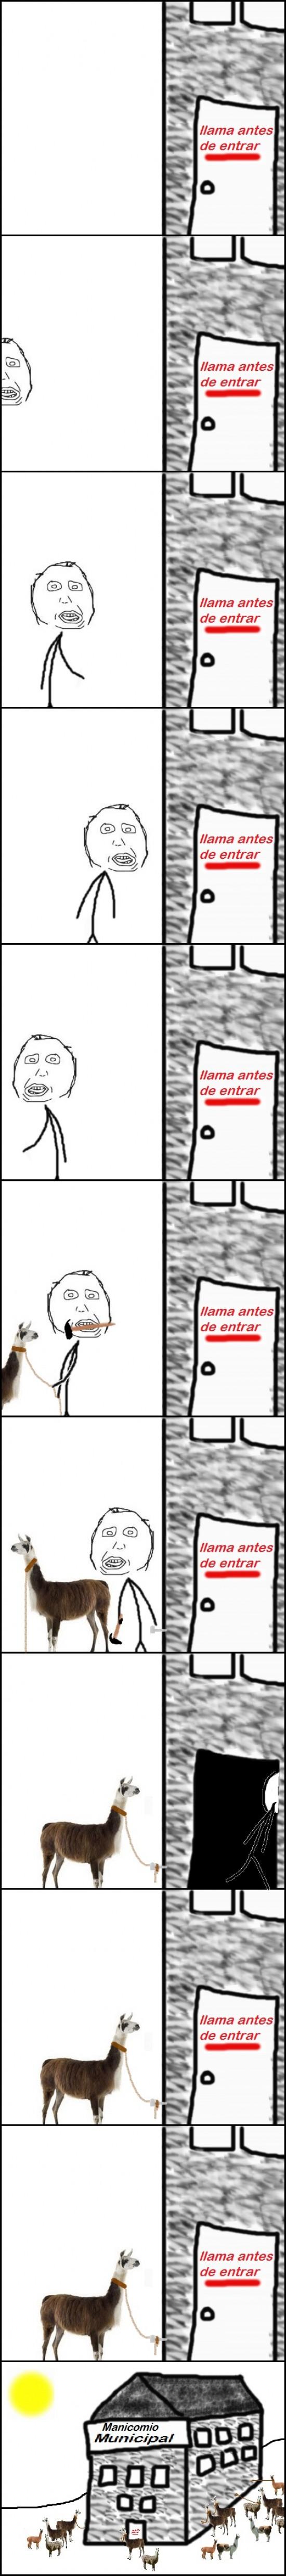 entrar,Llama,loco,manicomio,retarded